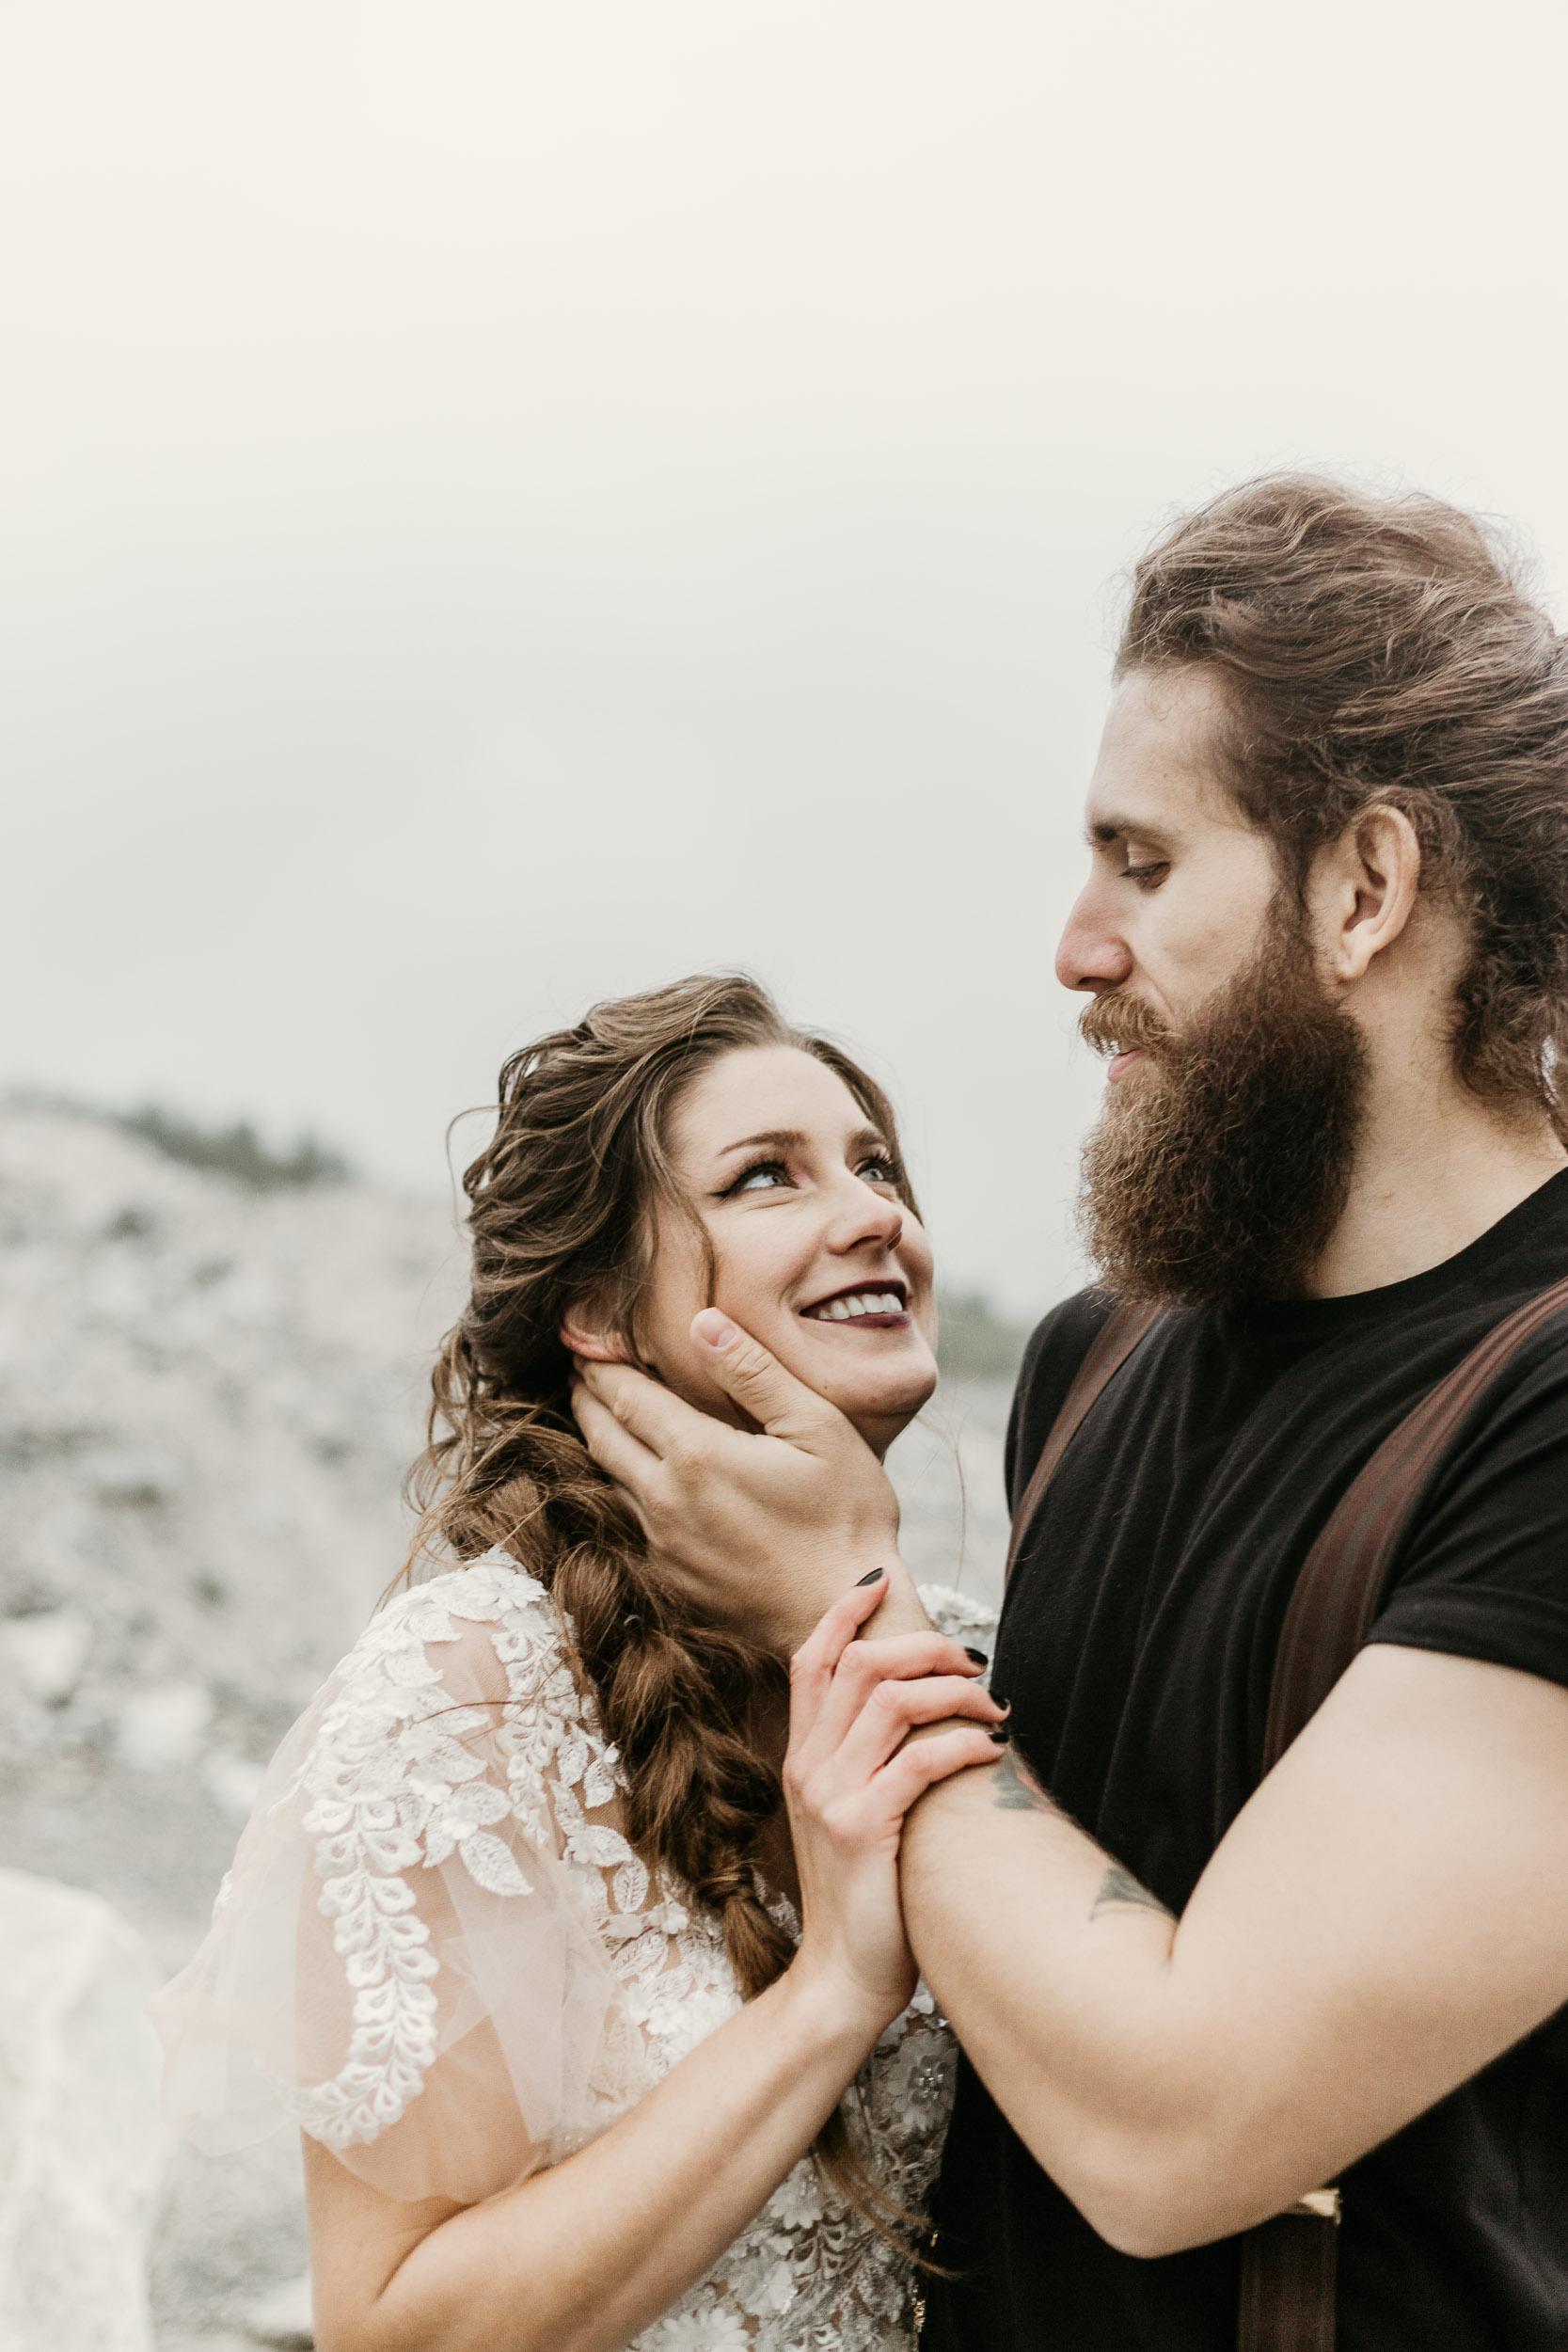 intimate-wedding-elopement-photographer-ottawa-toronto-1109.jpg